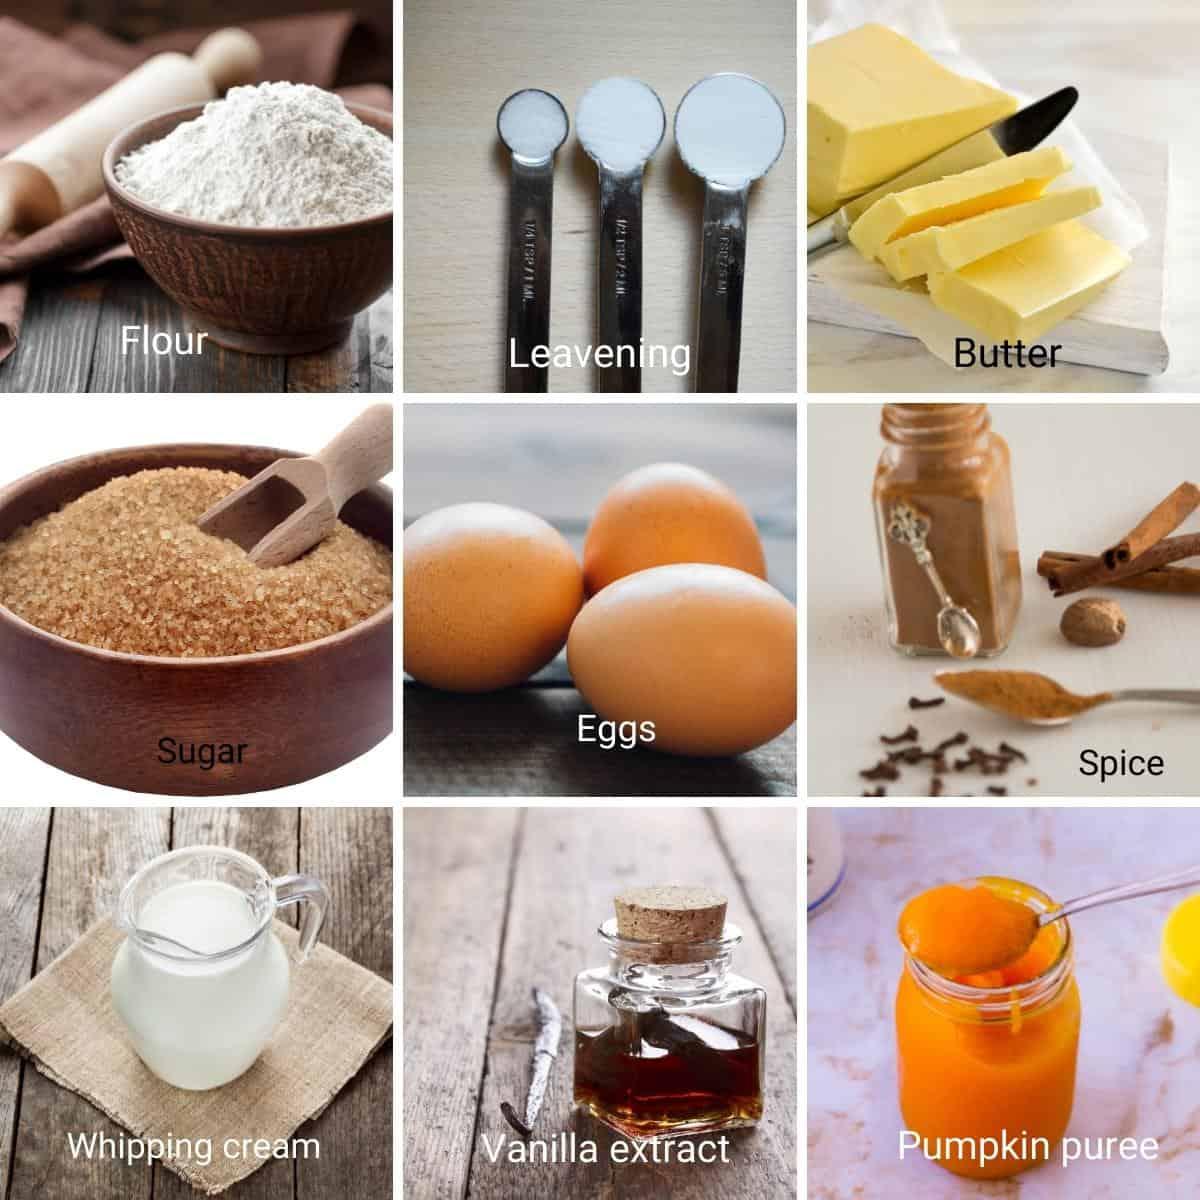 Ingredients for pumpkin cake recipe.